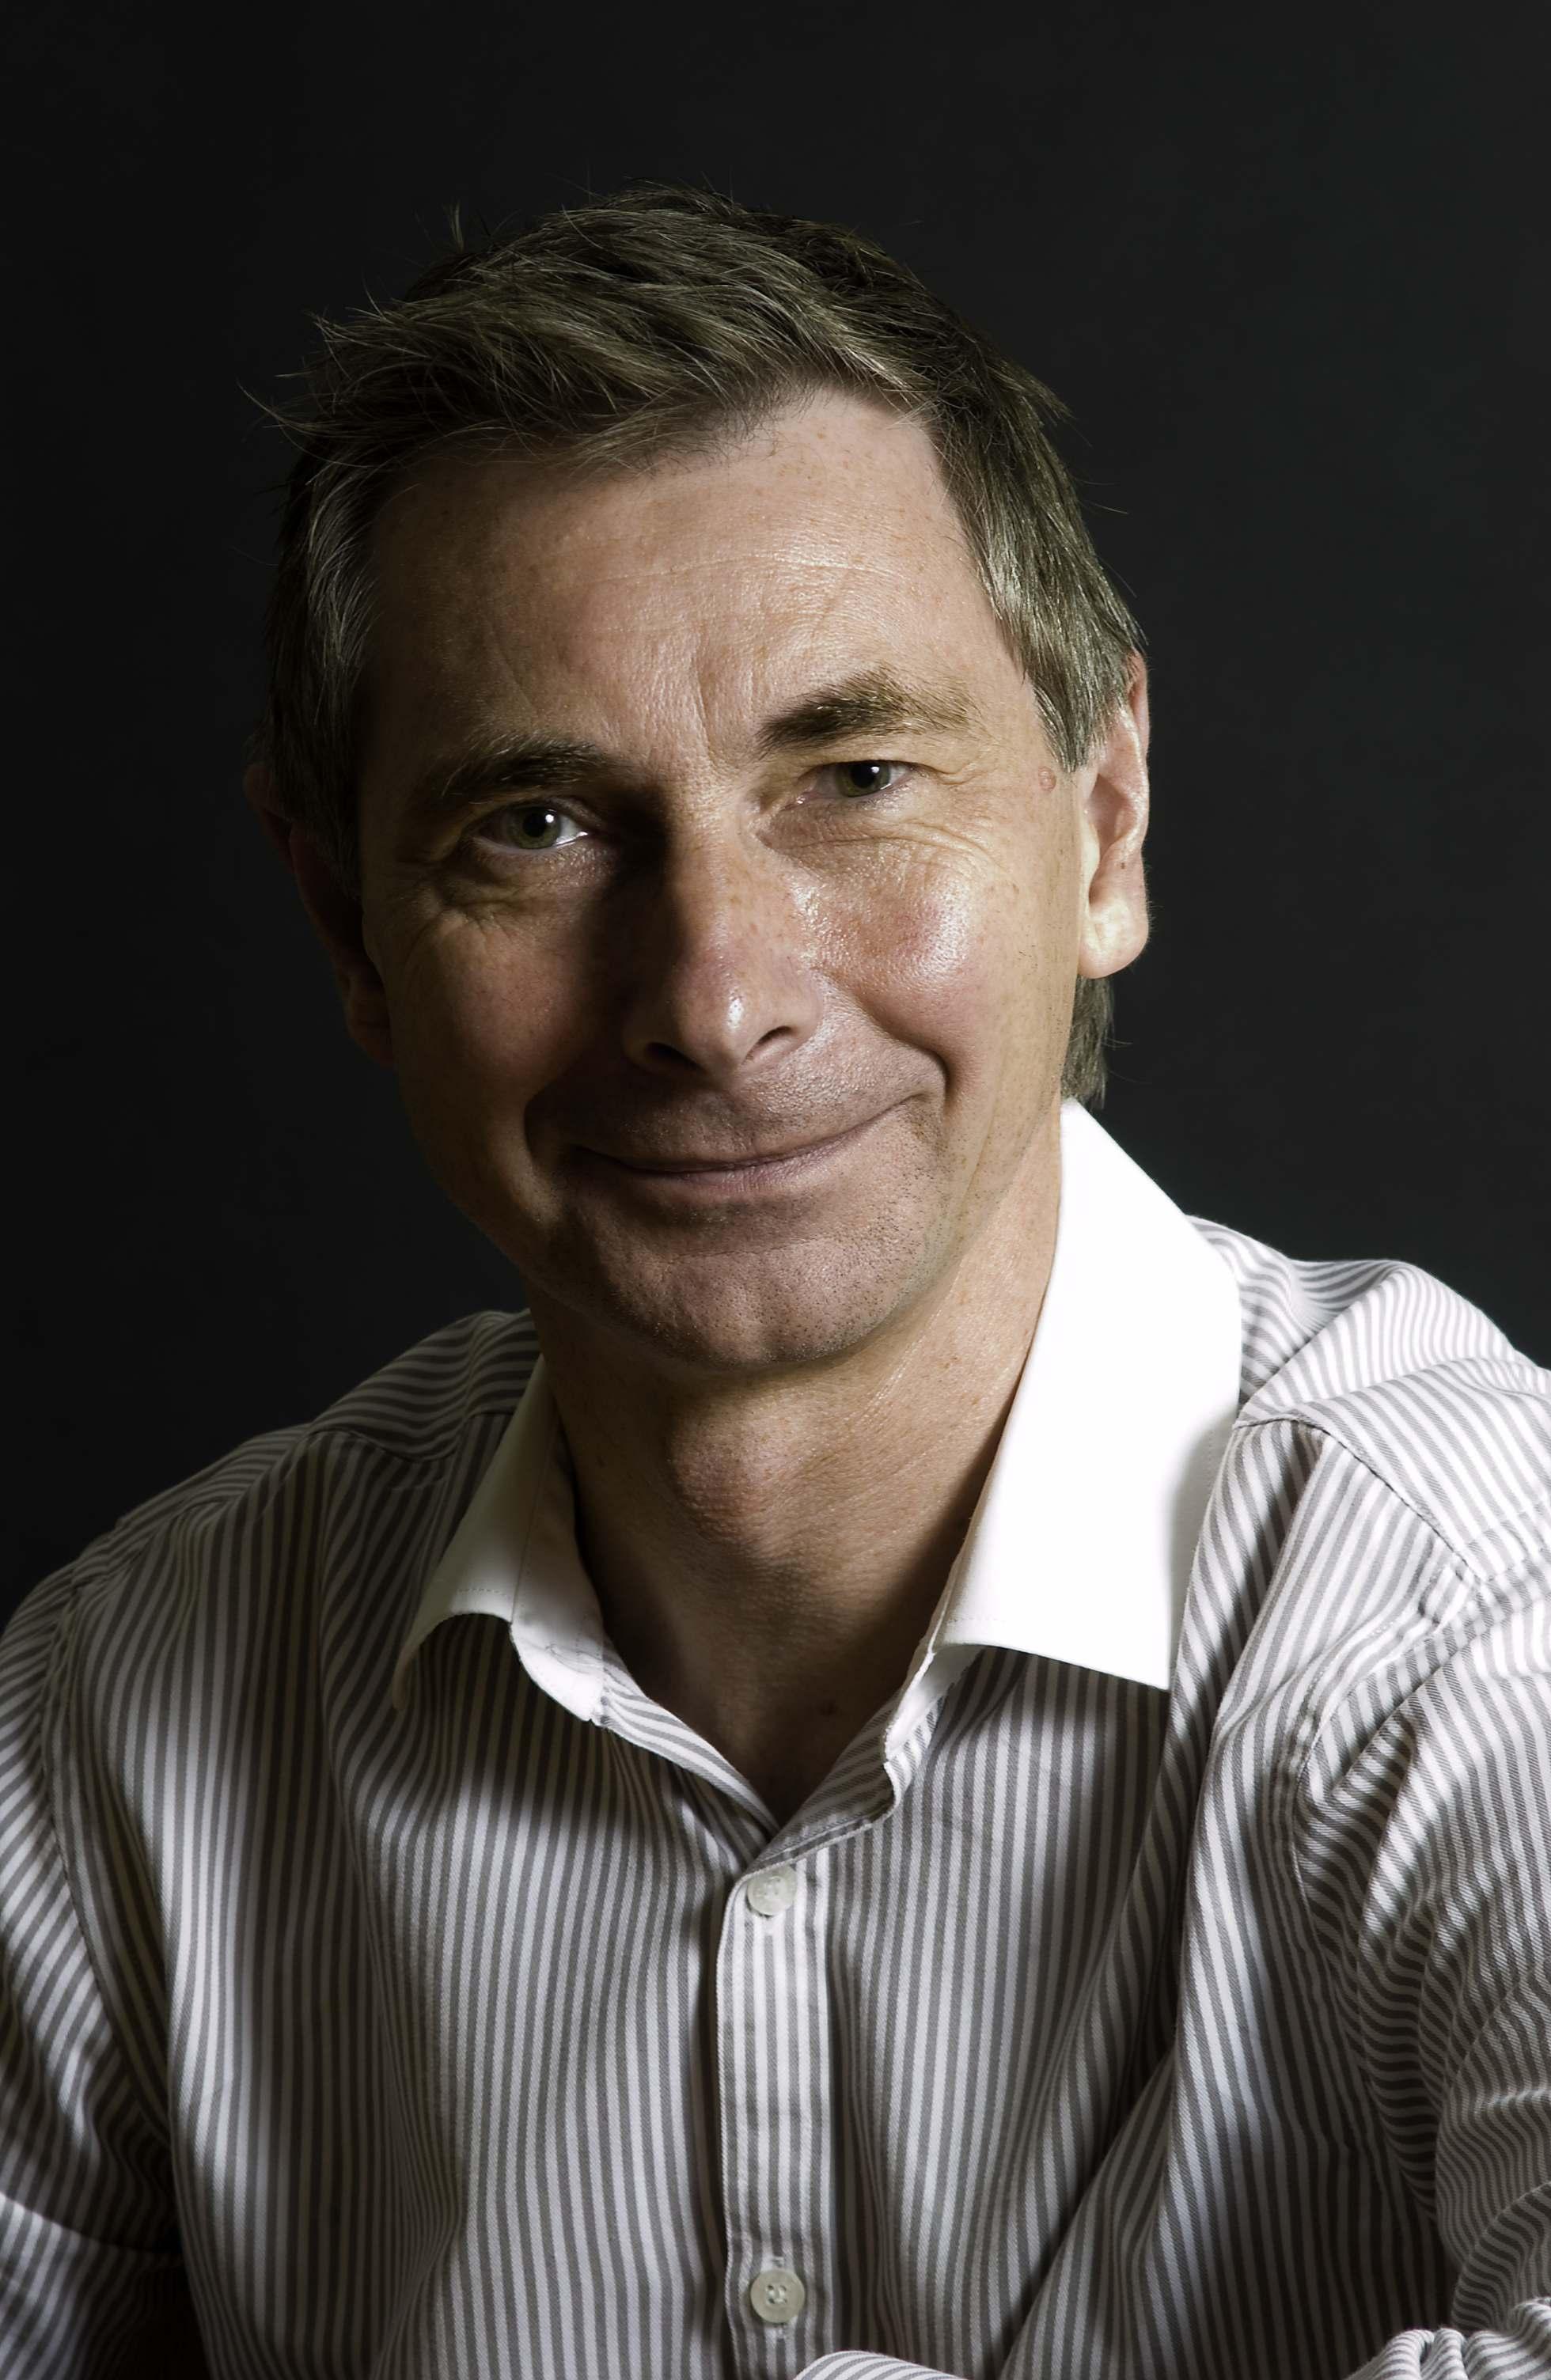 Steve Holton